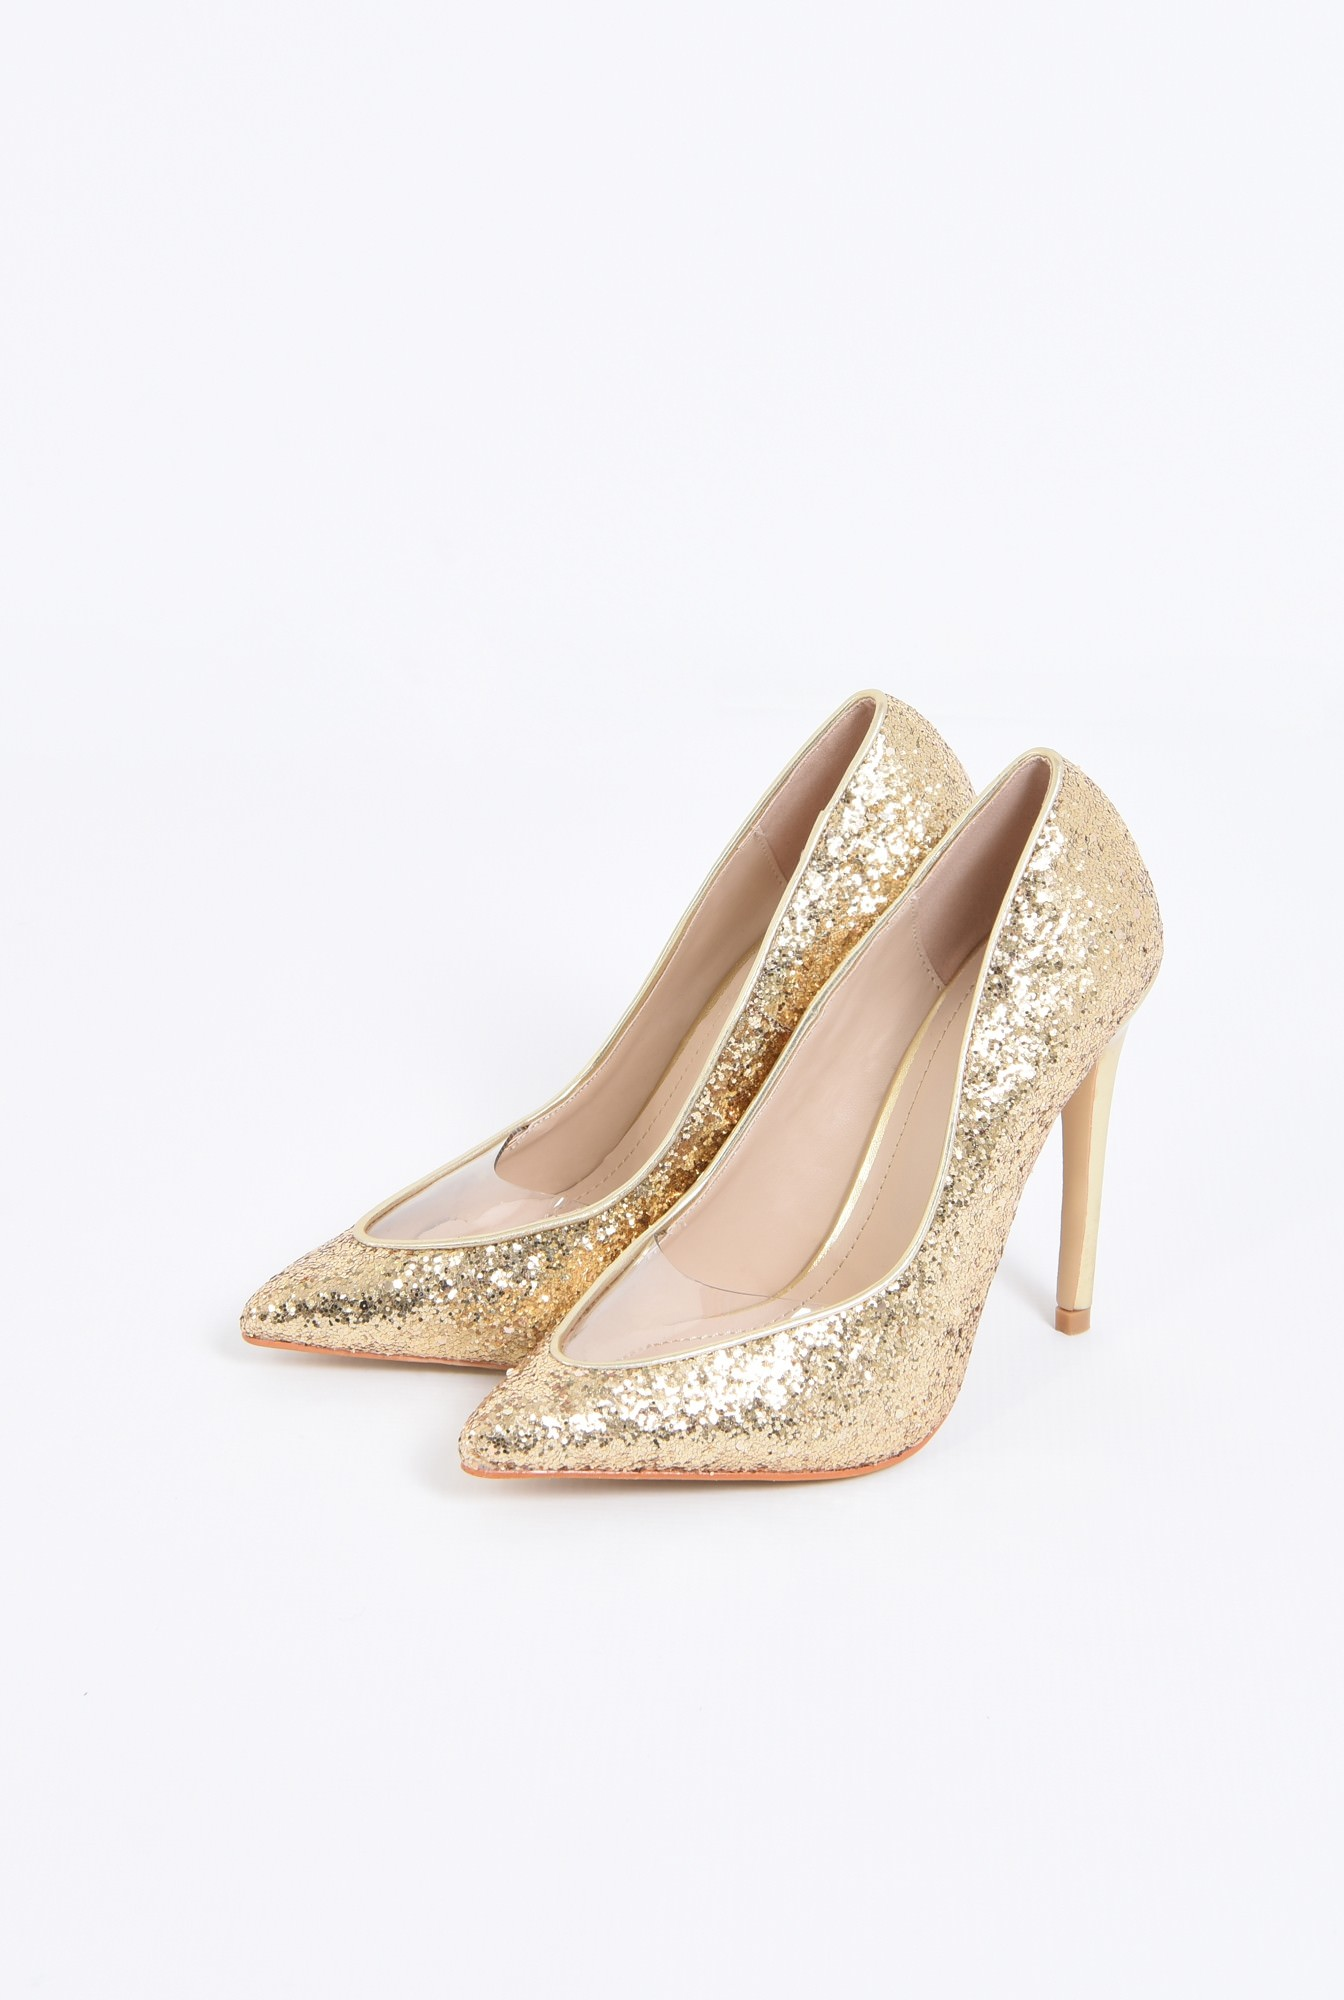 1 - pantofi eleganti, auriu, stiletto, glitter